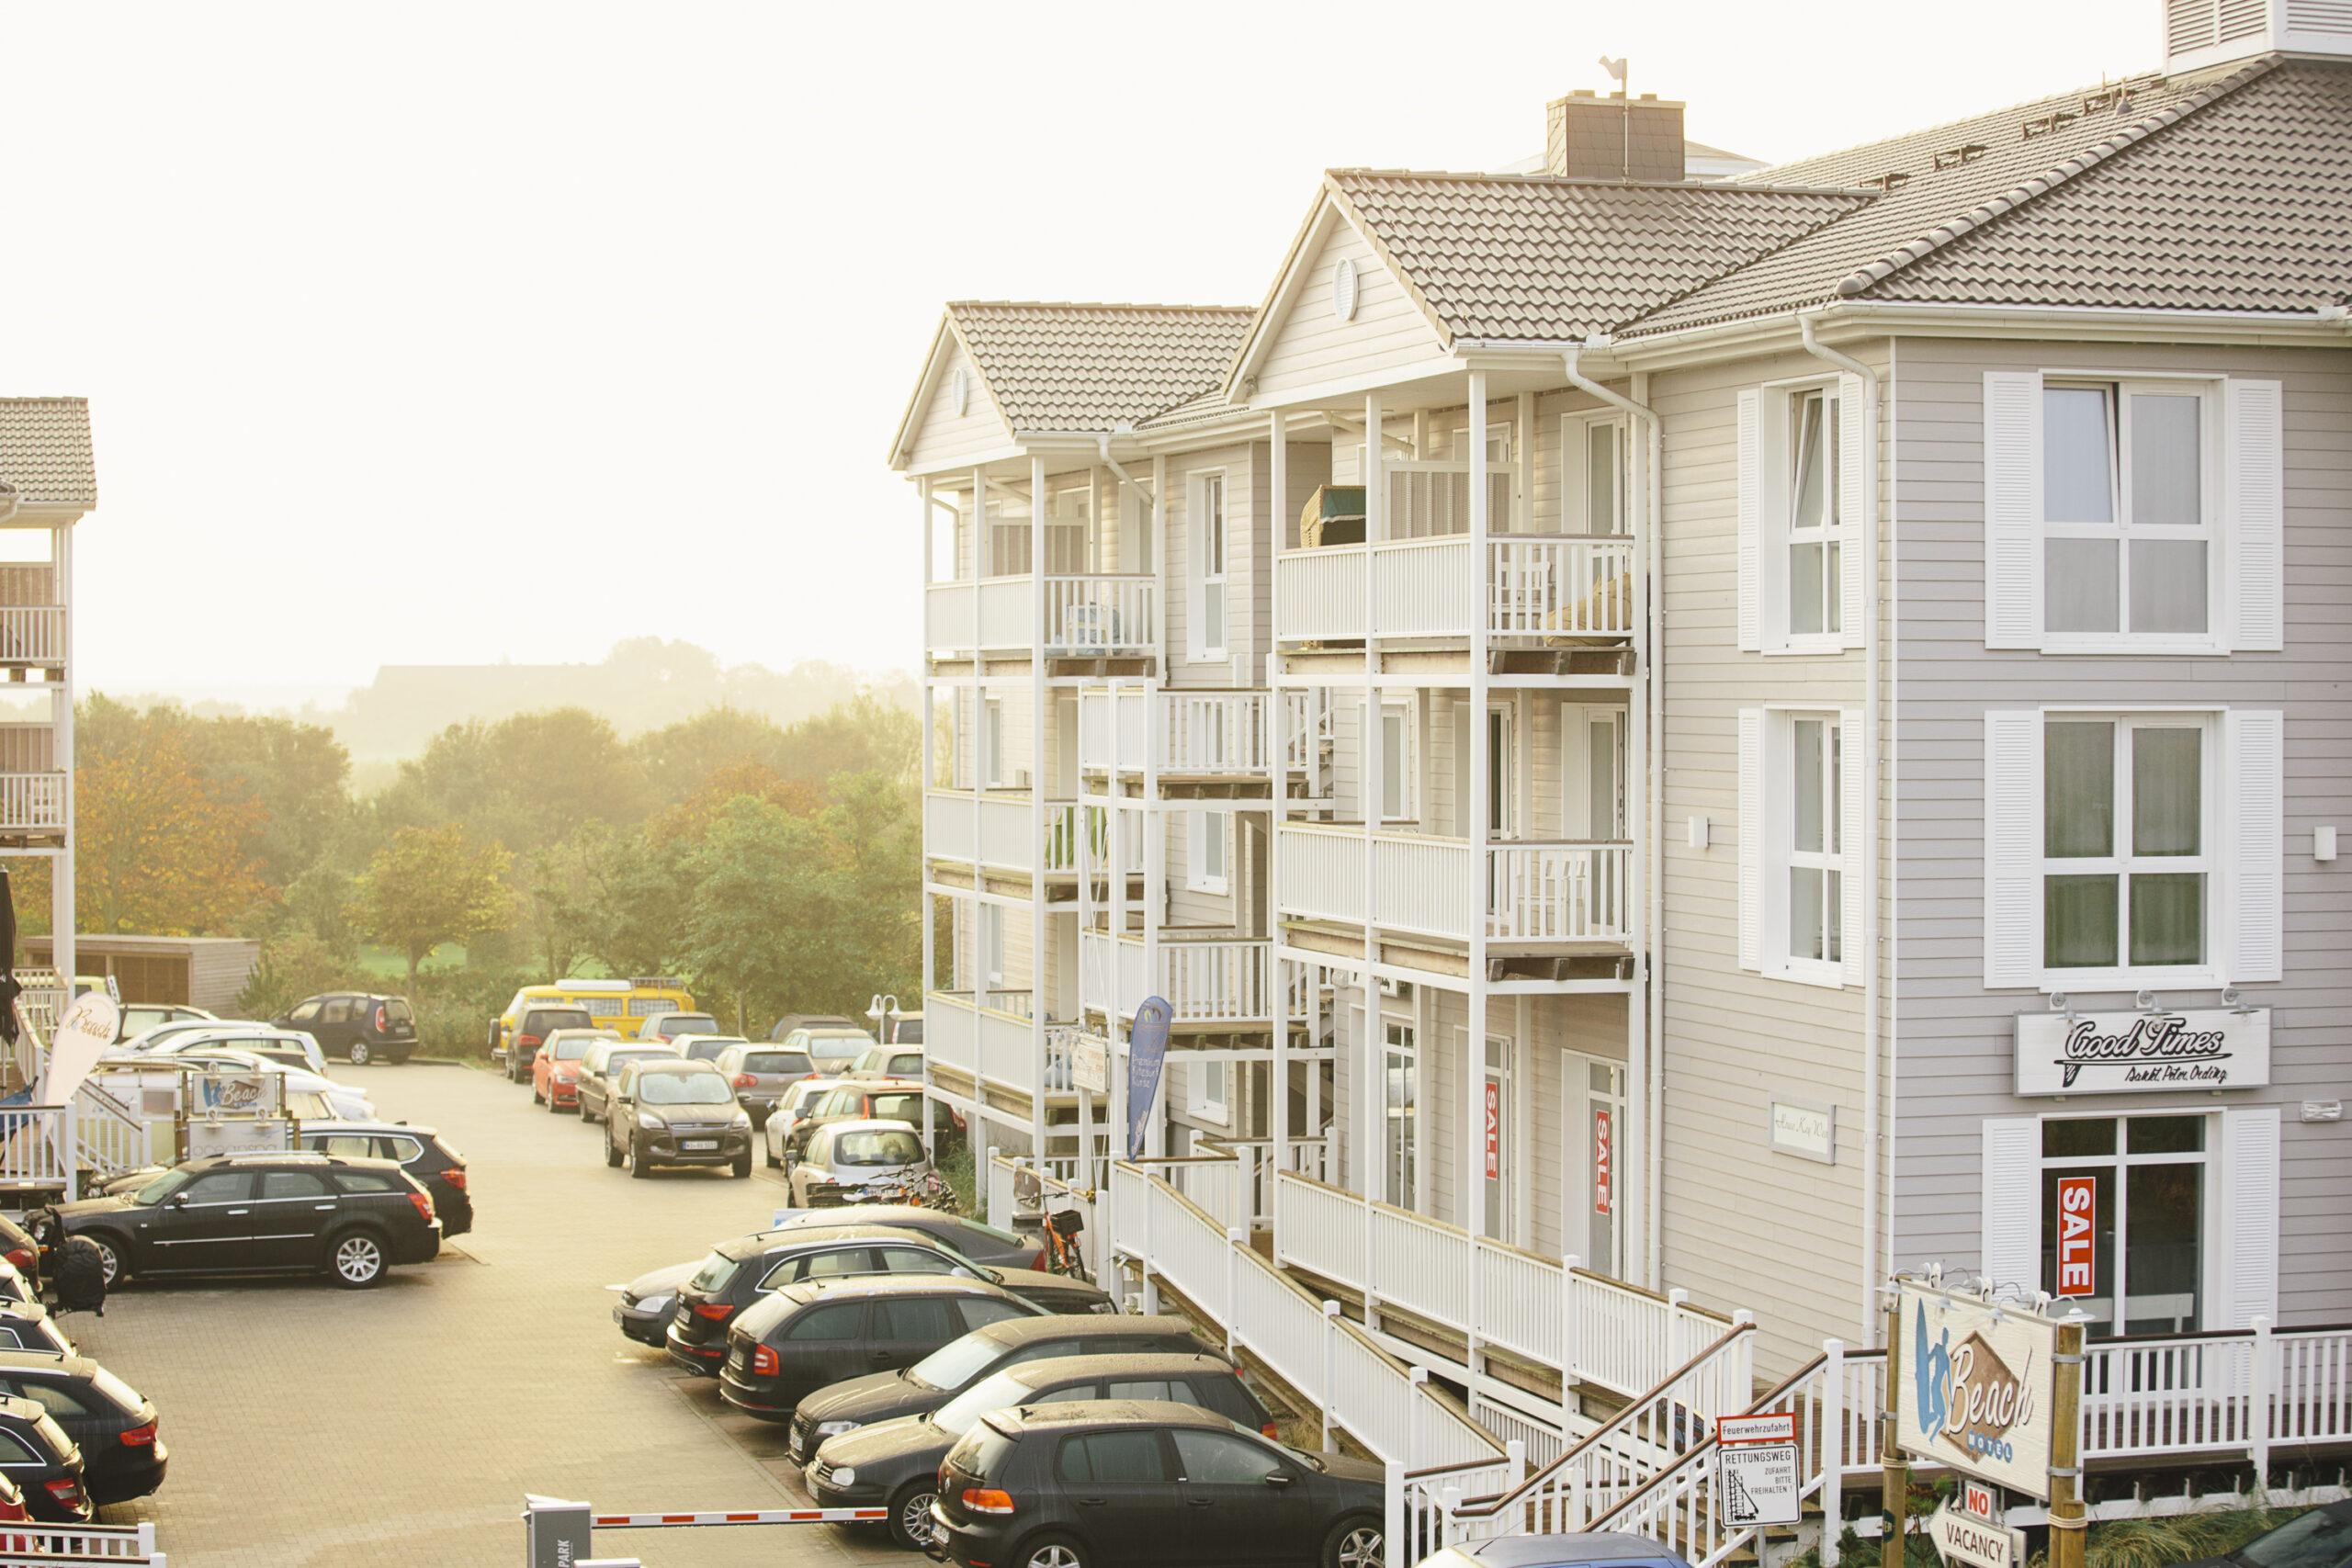 Beach Motel – St. Peter Ording